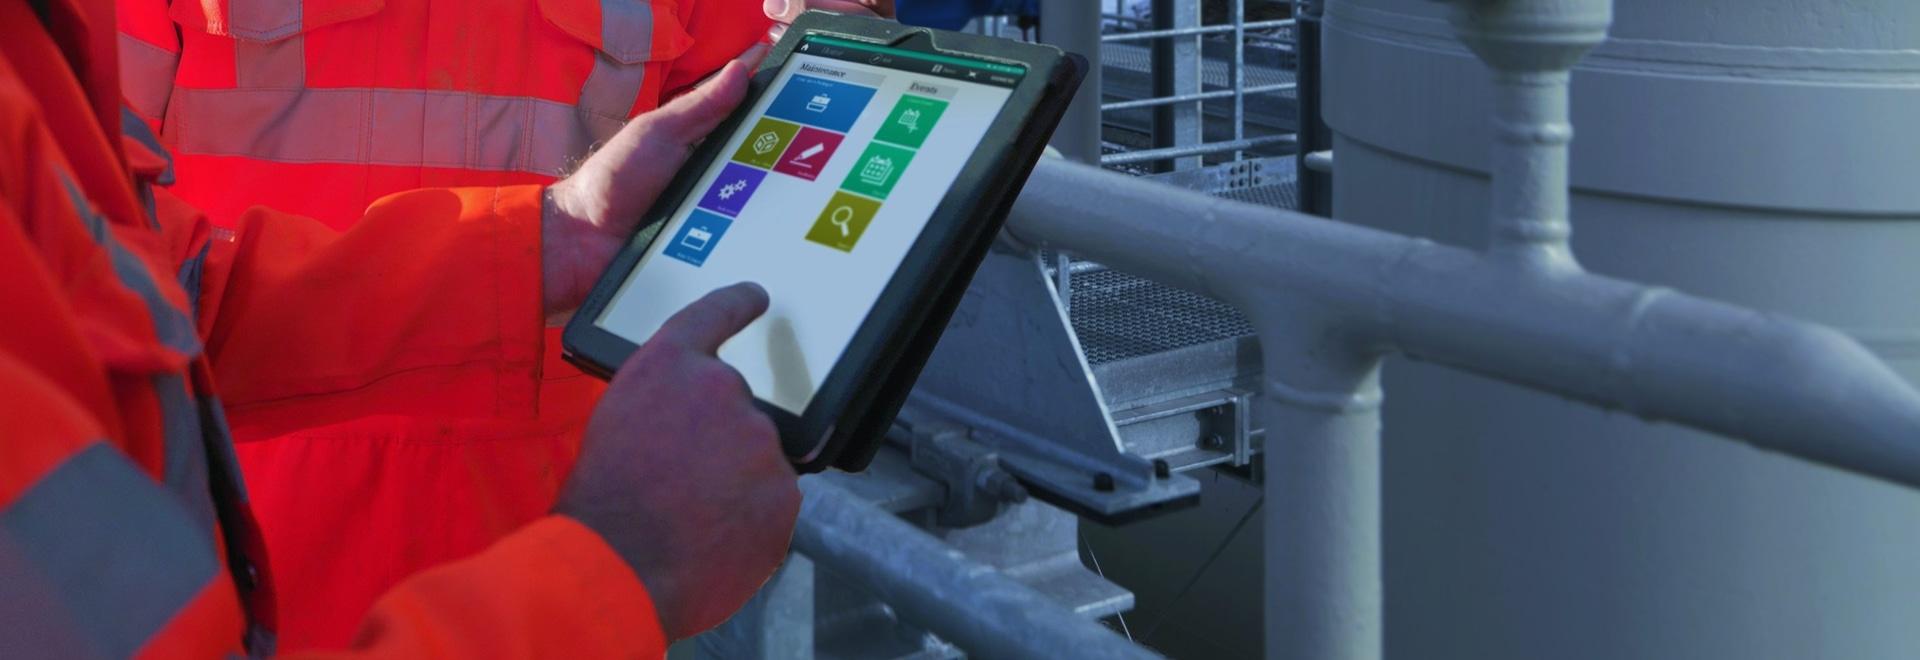 Digital assistant for maintenance personnel